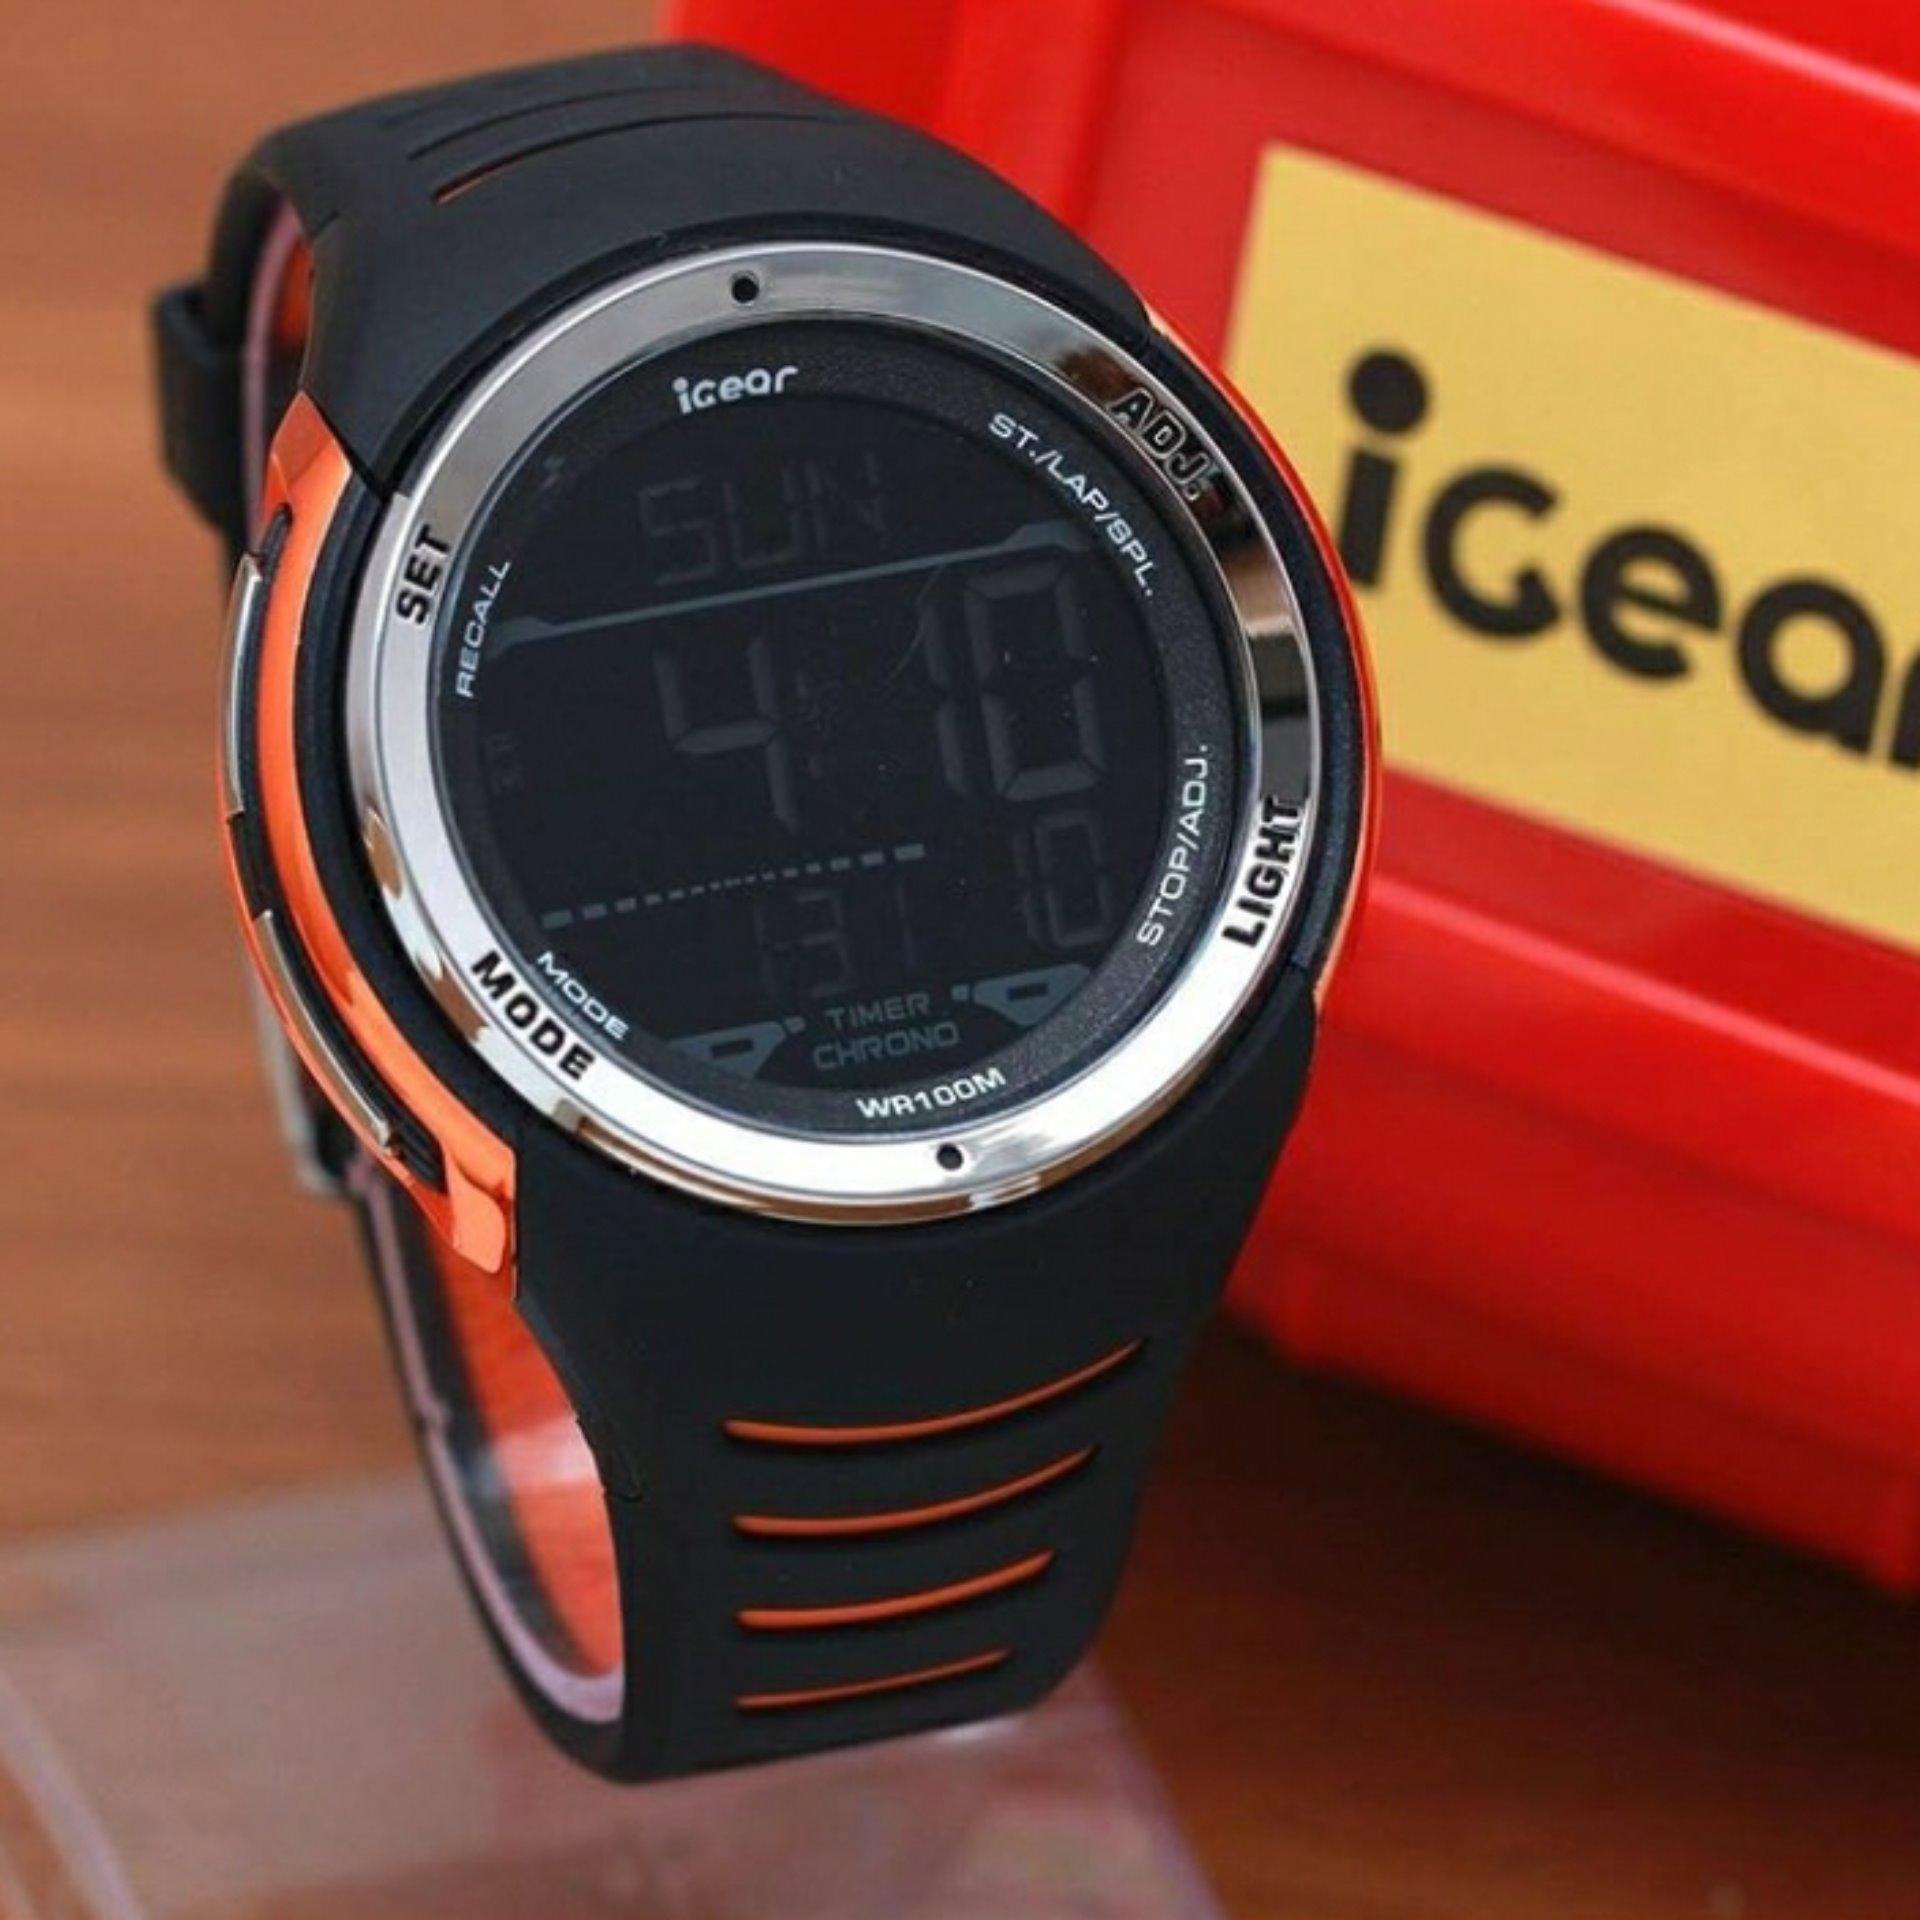 Sanwood 630440 Jam Tangan Pria Strap Karet Sports Racing Biru Adidas Adh9070 Gt Rubber Mens Watch Source Igear Original I16